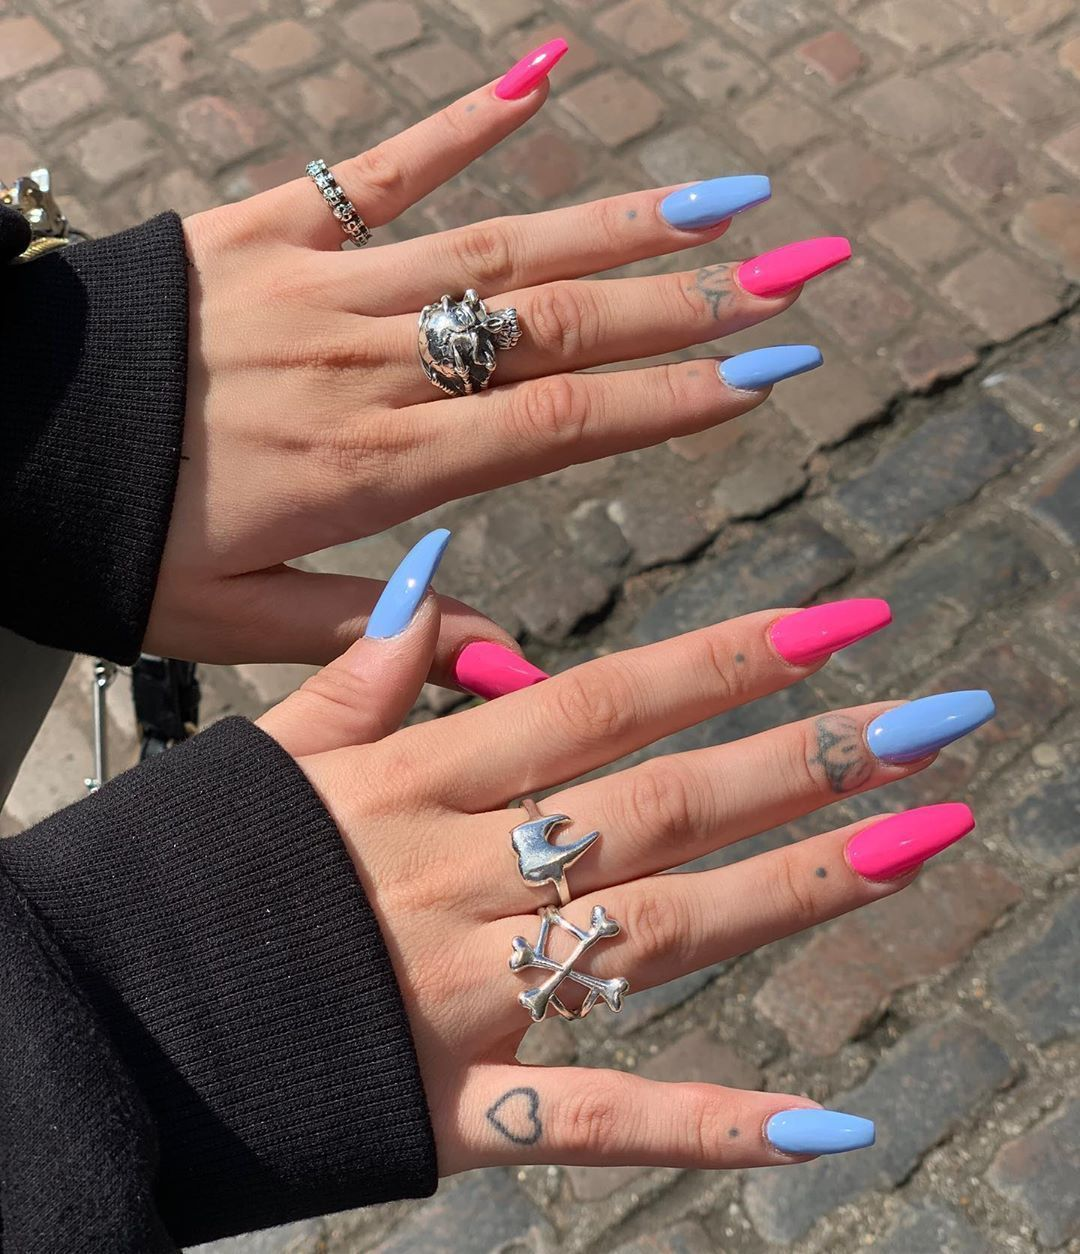 Photo of ✔ Nagel Acryl Blau Rosa #nailsofelpaso #acryilicnails #nailsofinstsgram #Herb …